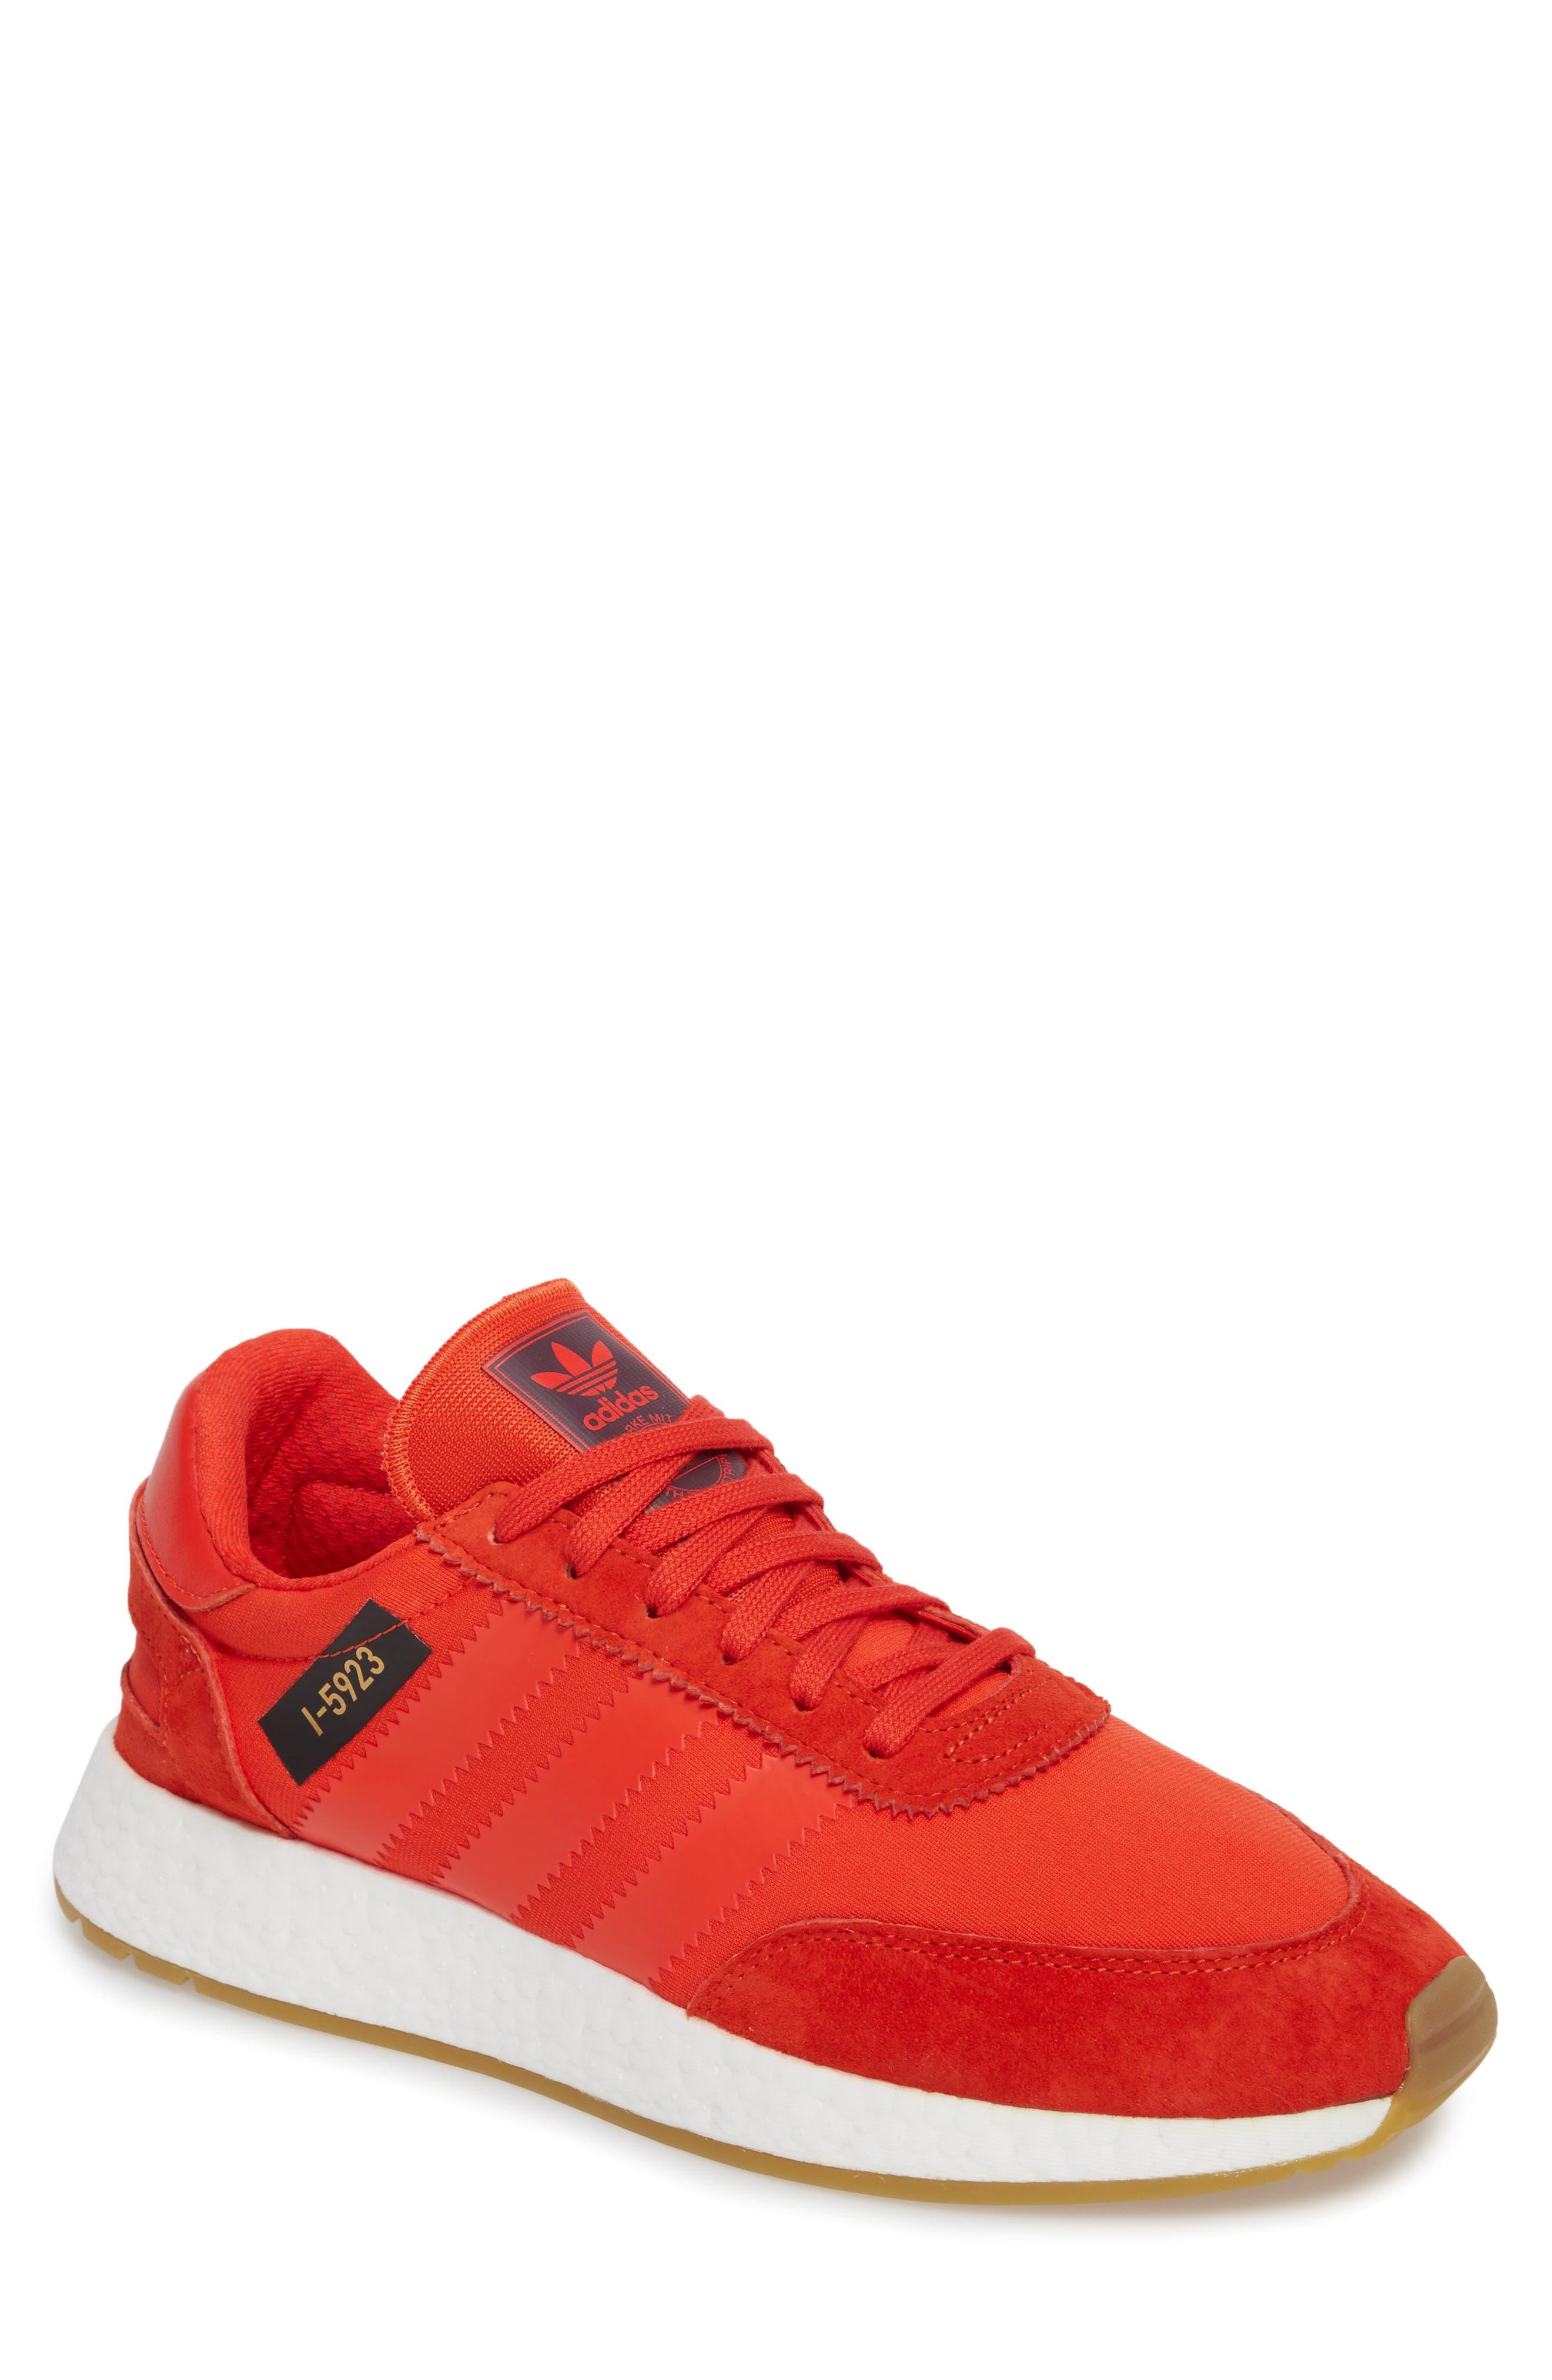 Main Image - adidas I-5923 Sneaker (Men)